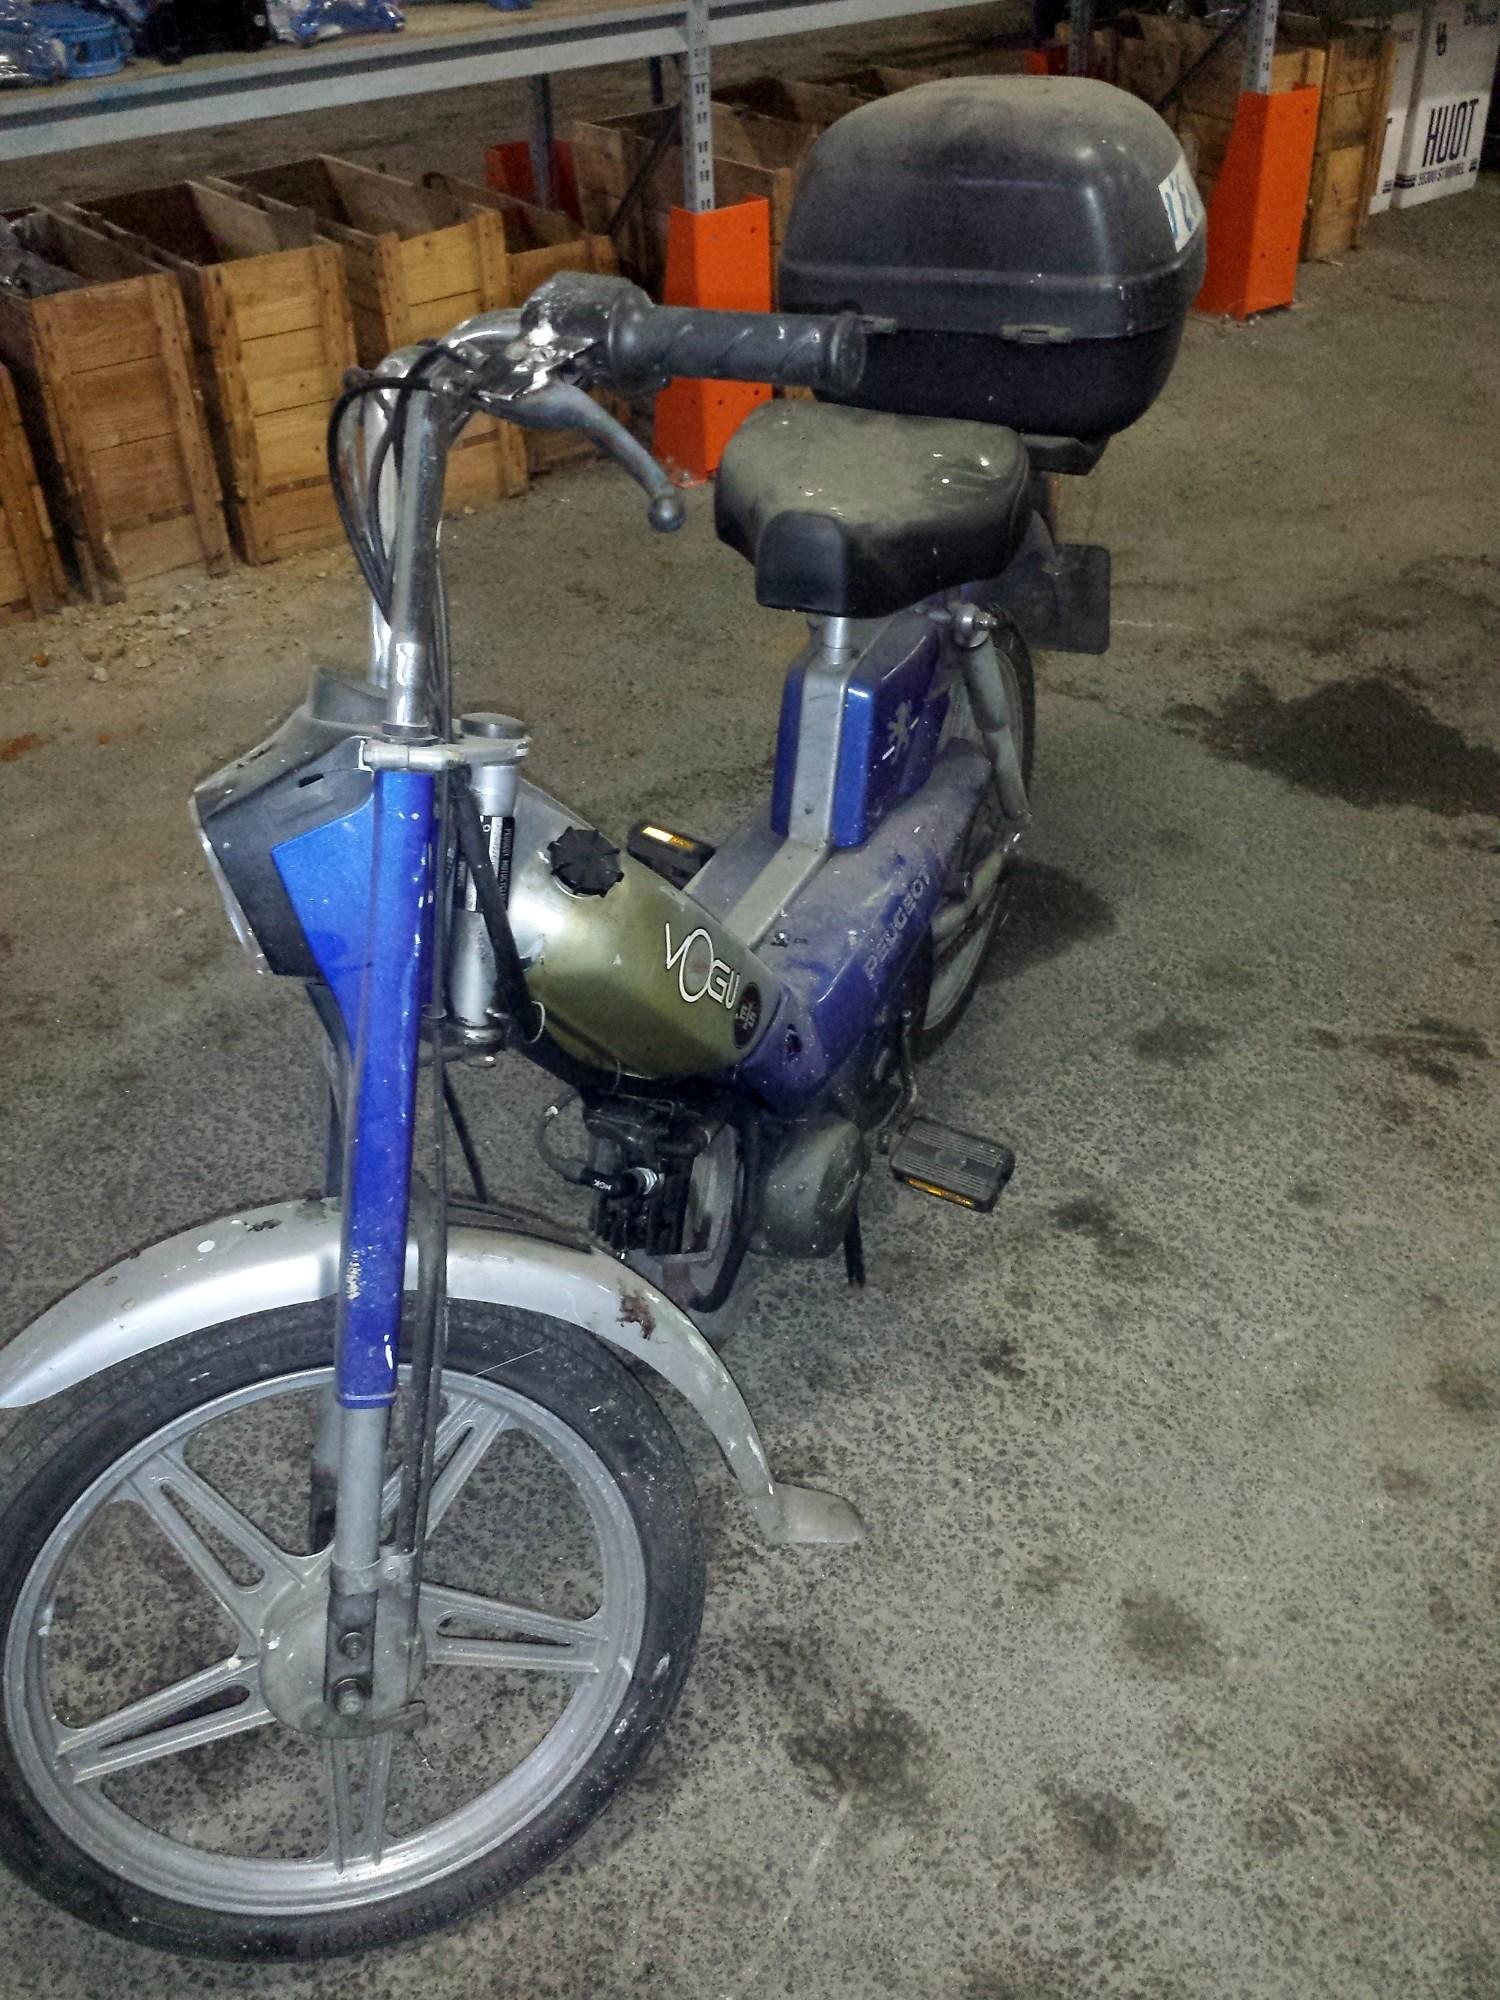 cyclomoteur peugeot moto scooter 2 roues d 39 occasion aux ench res agorastore. Black Bedroom Furniture Sets. Home Design Ideas